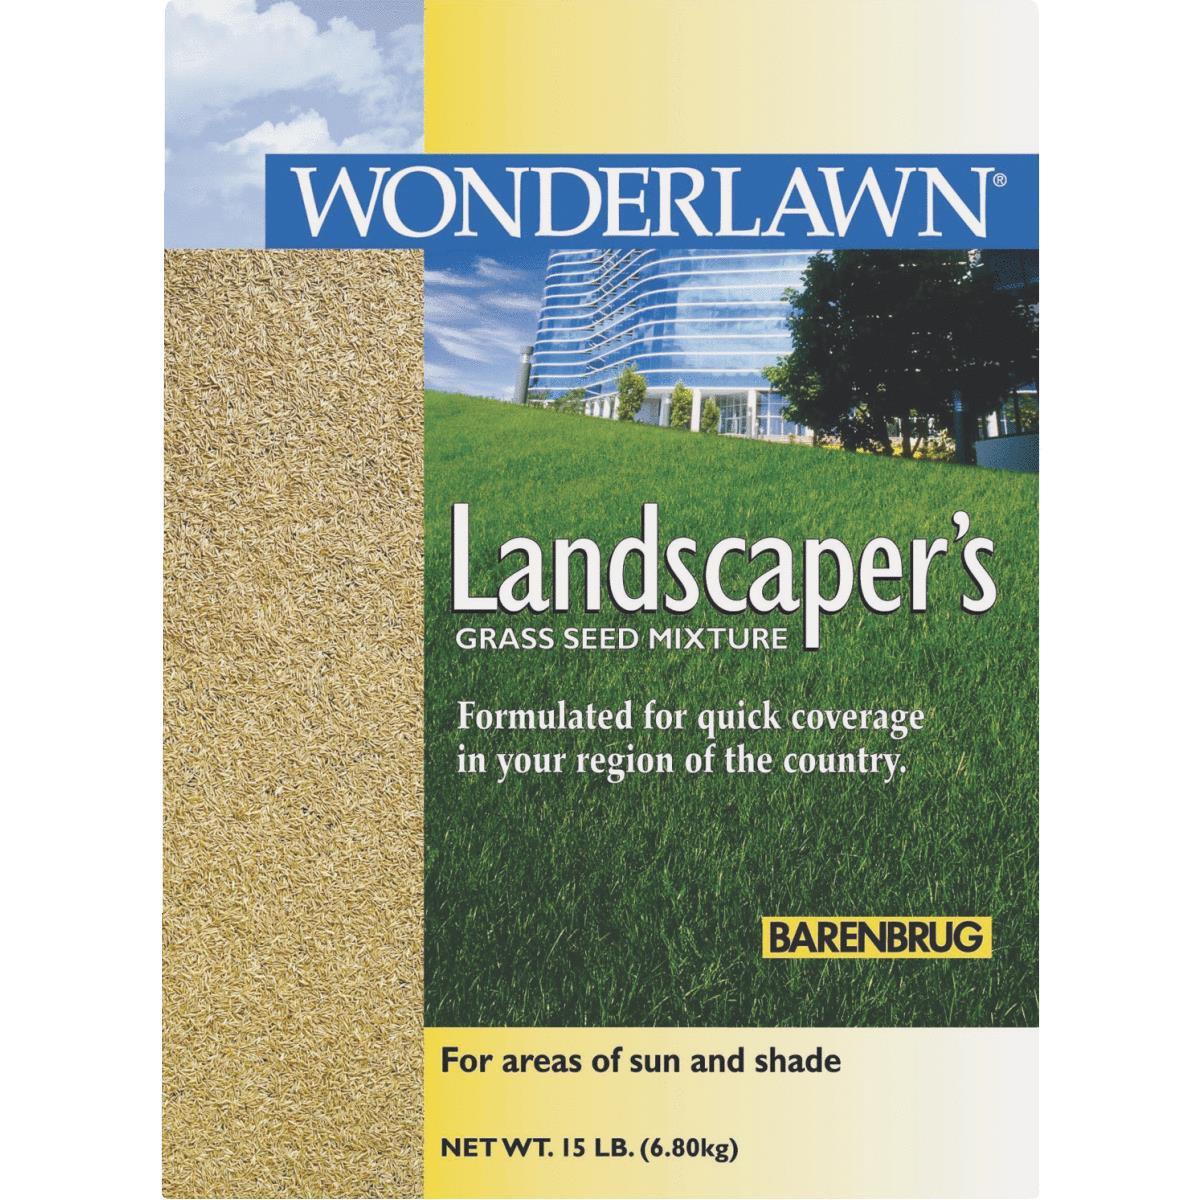 Barenbrug Wonderlawn Landscaper's Grass Seed